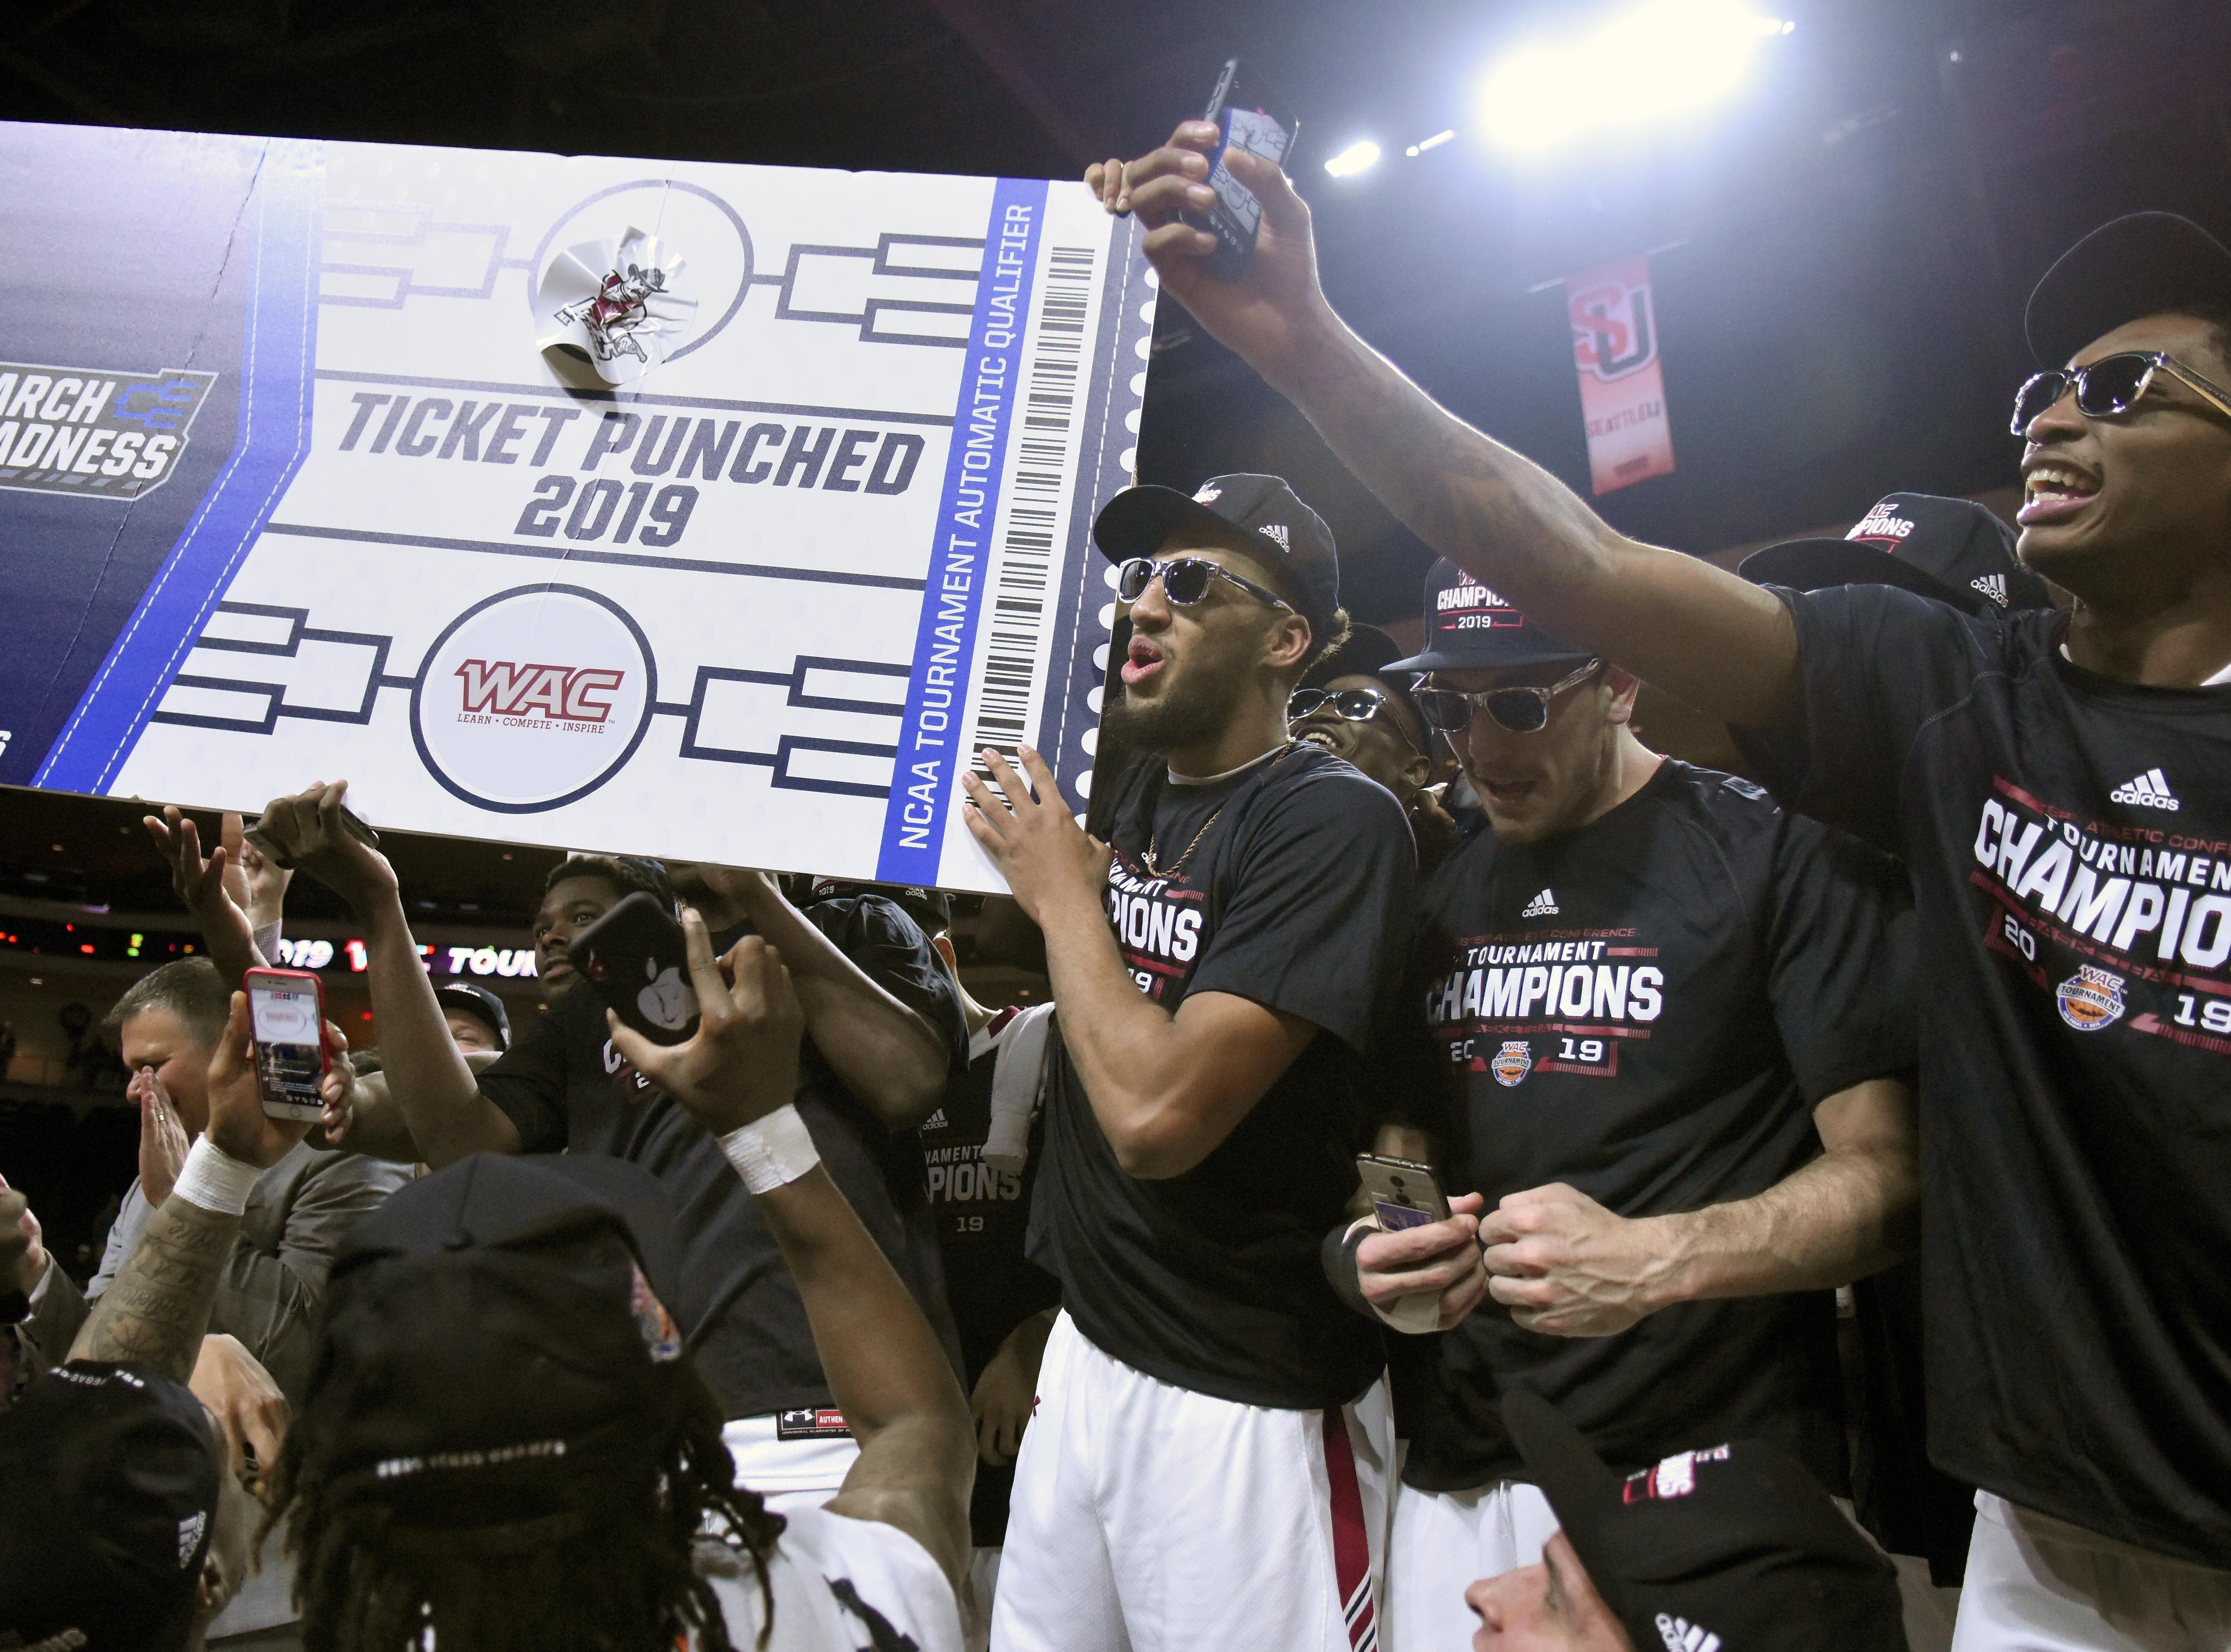 New Mexico State won its third straight WAC Tournament championship.